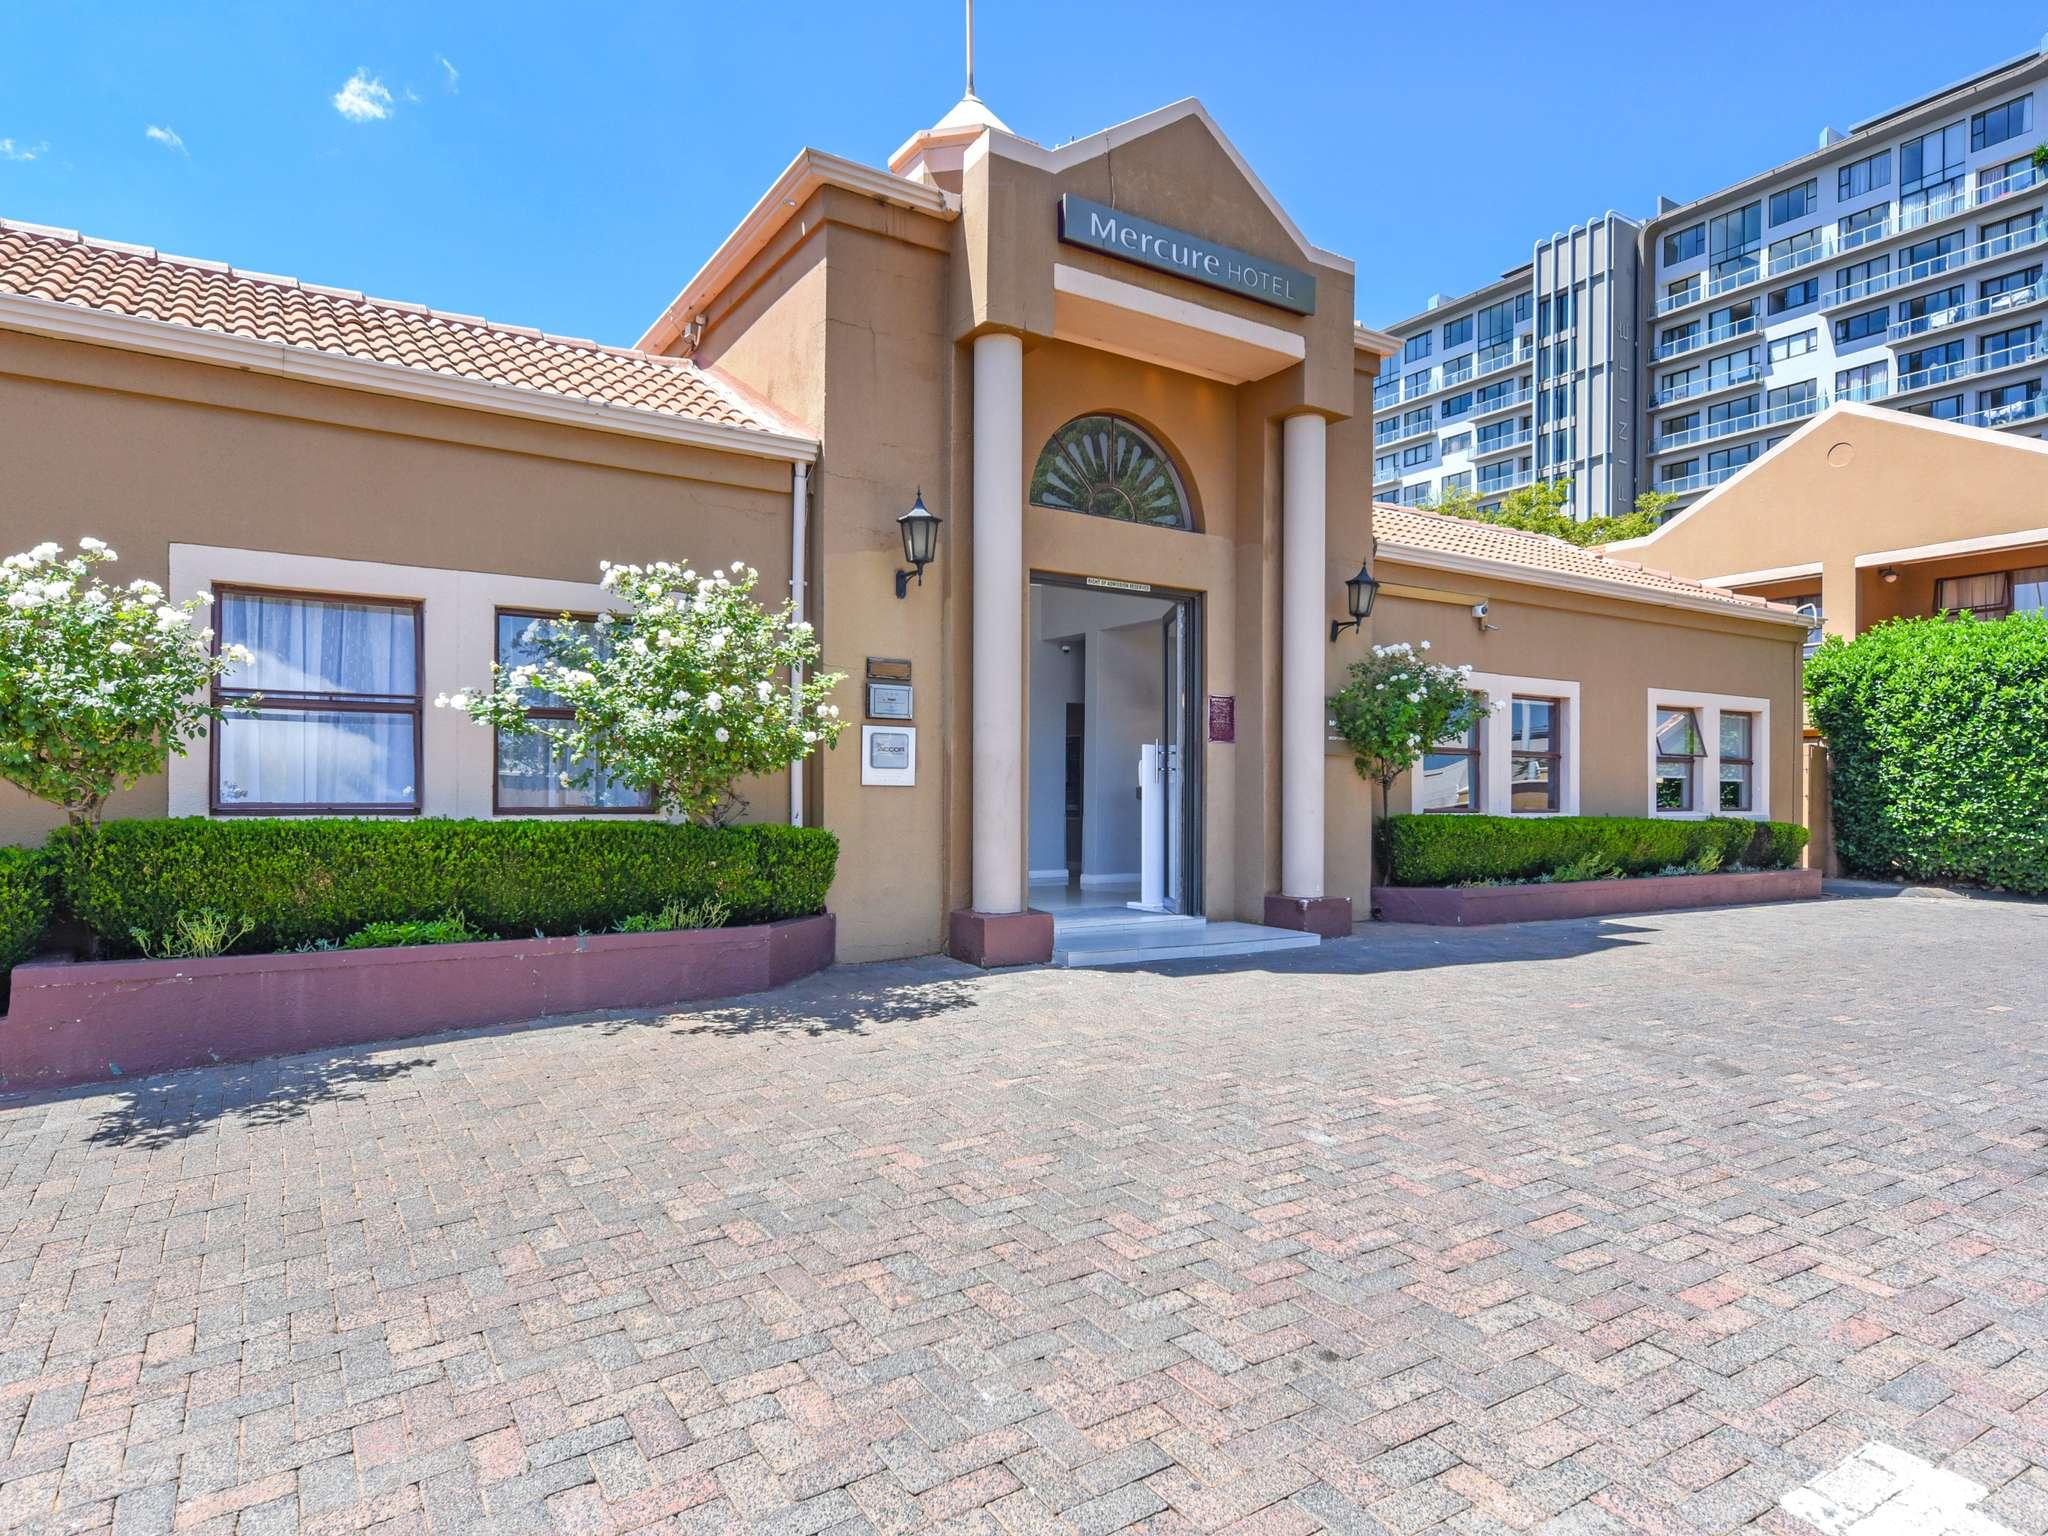 Hôtel - Mercure Johannesburg Bedfordview Hotel